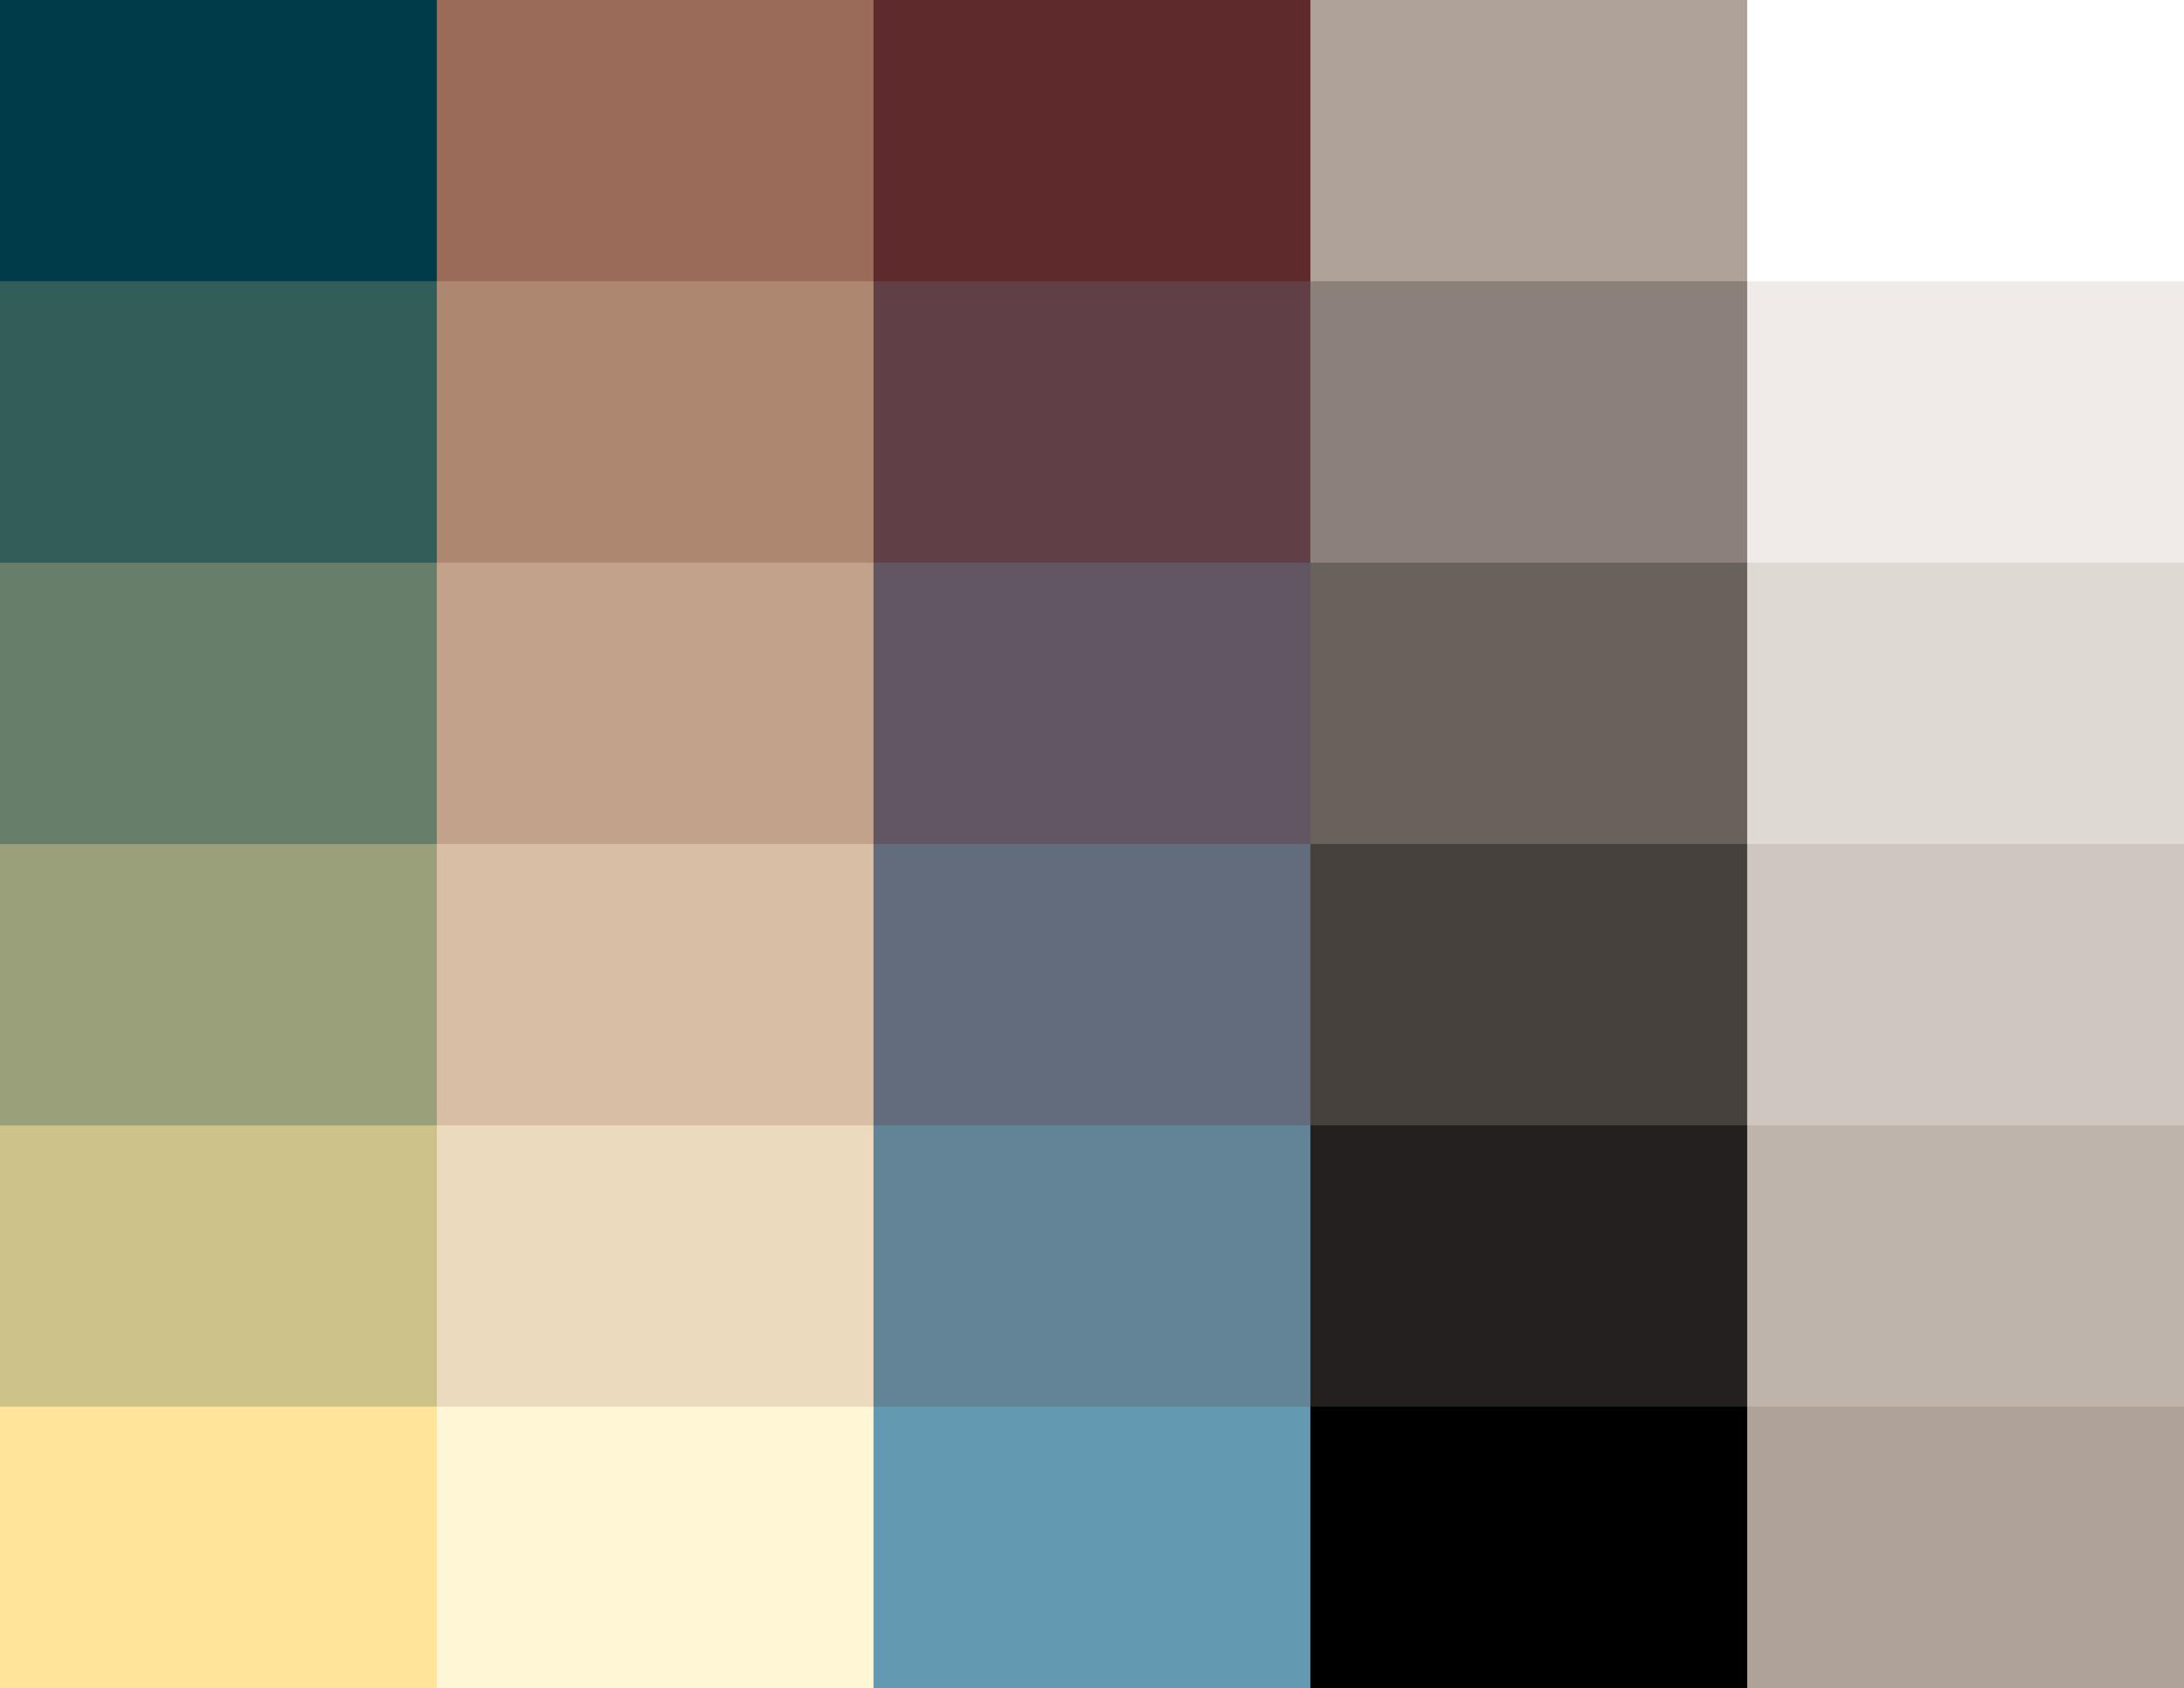 Wordmark_Allison_ColorPalette_Jan_8_2018-11.png